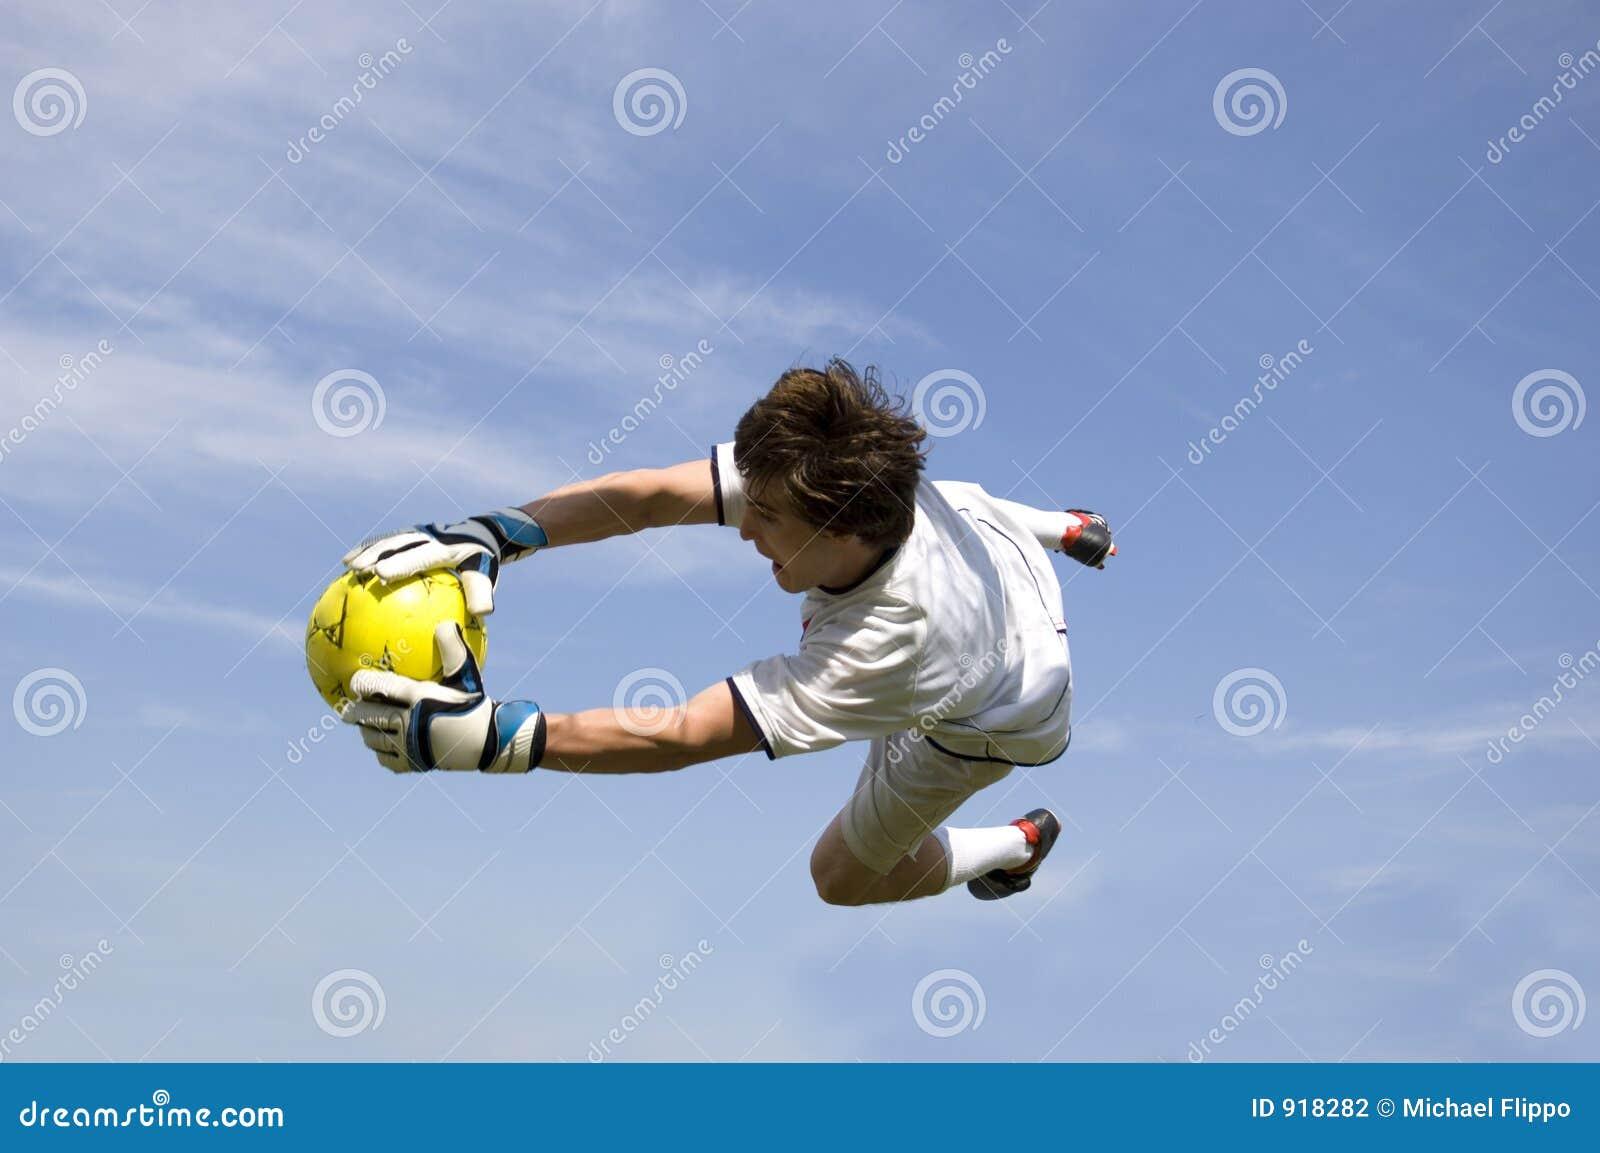 Le football - garde de but du football effectuant sauf